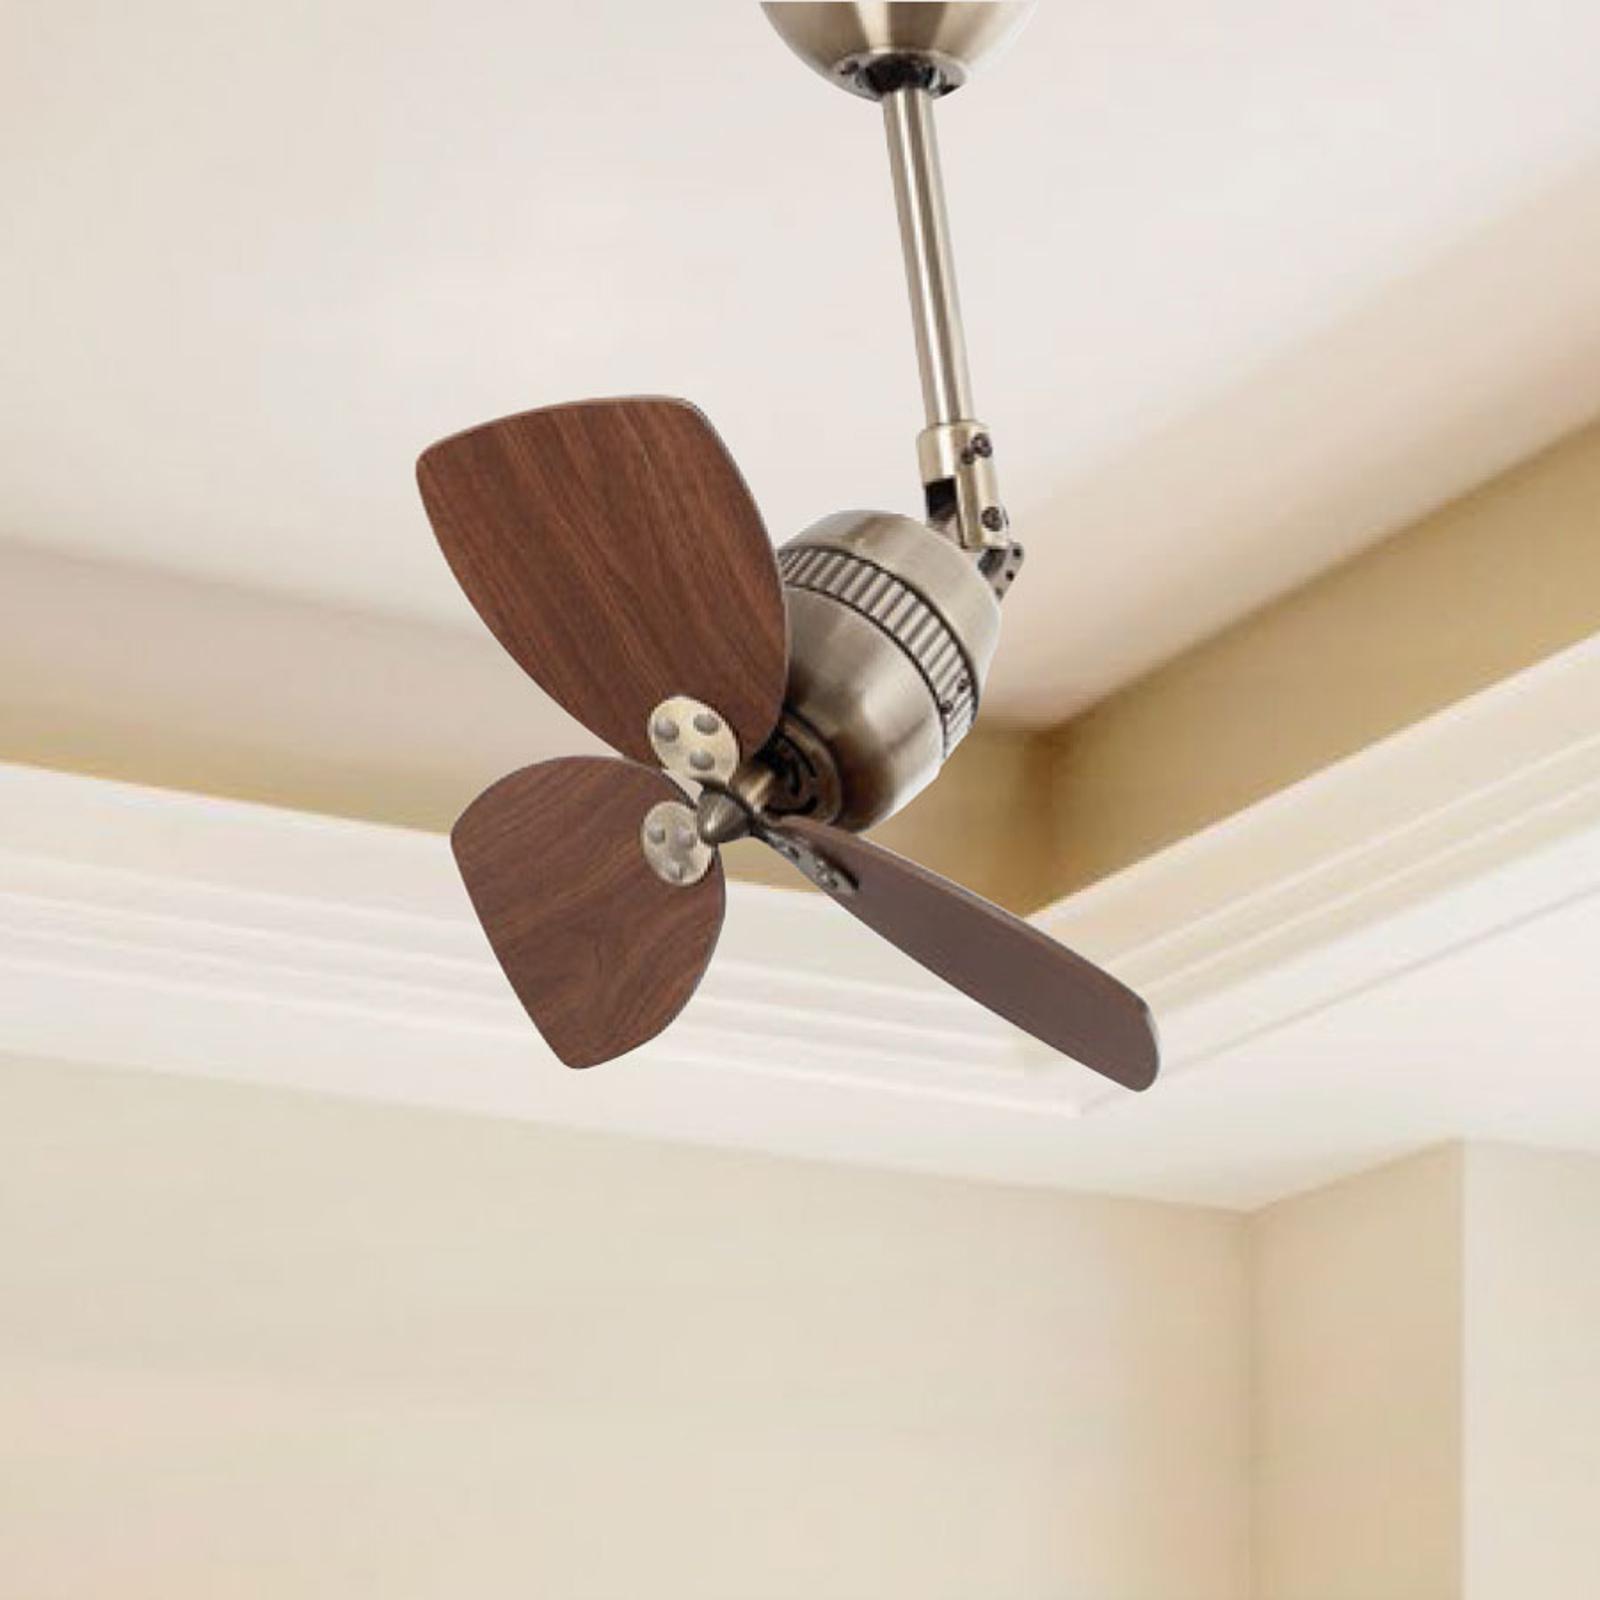 Vedra Comfortable Ceiling Fan_3506892_1